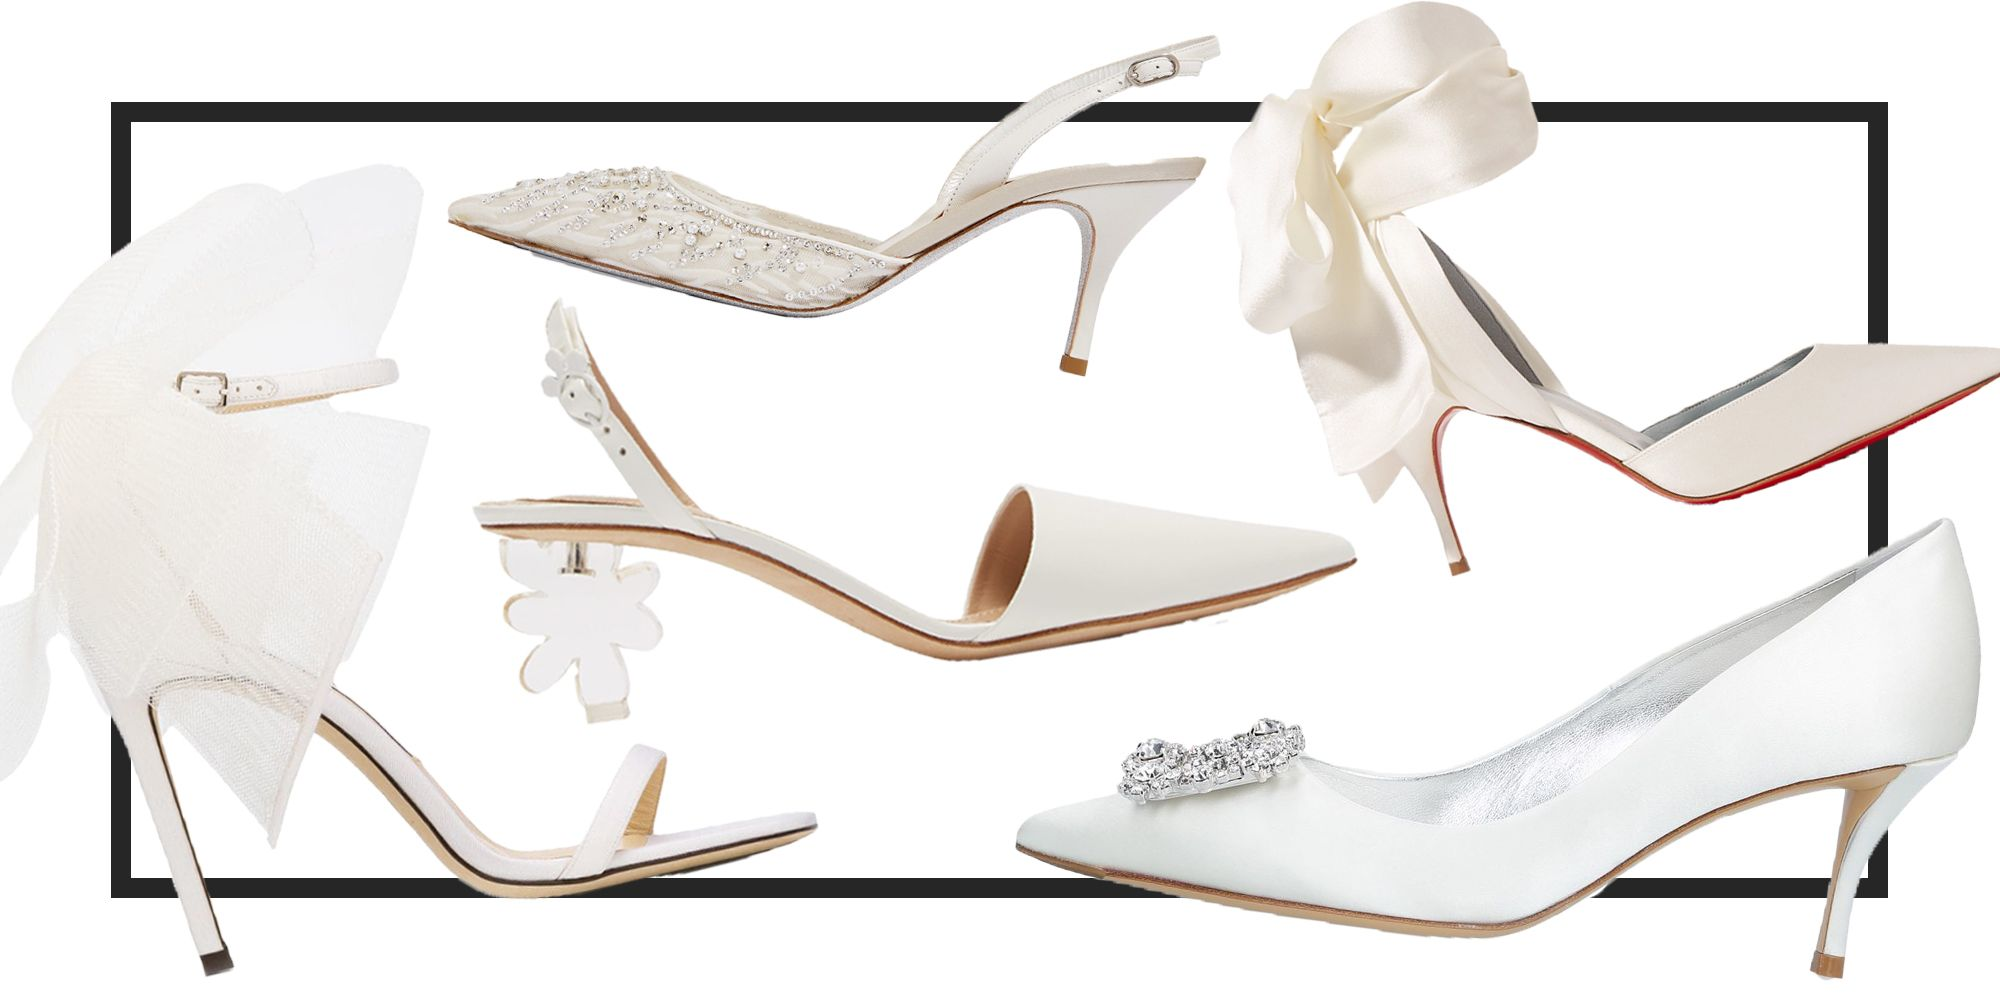 Best wedding shoes – Best shoes for brides